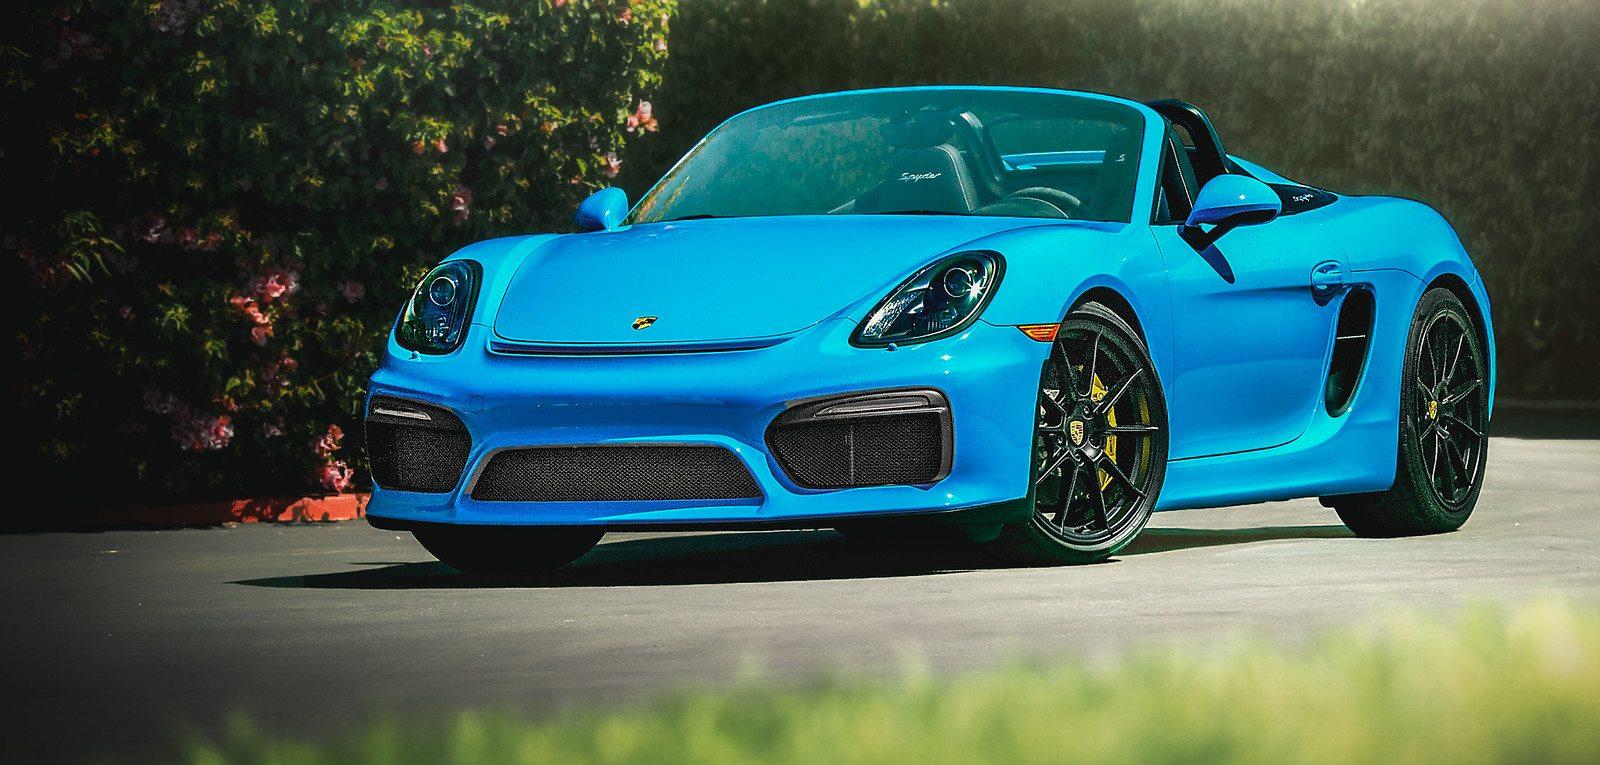 2016 Porsche Boxster Spyder  DJM Investments